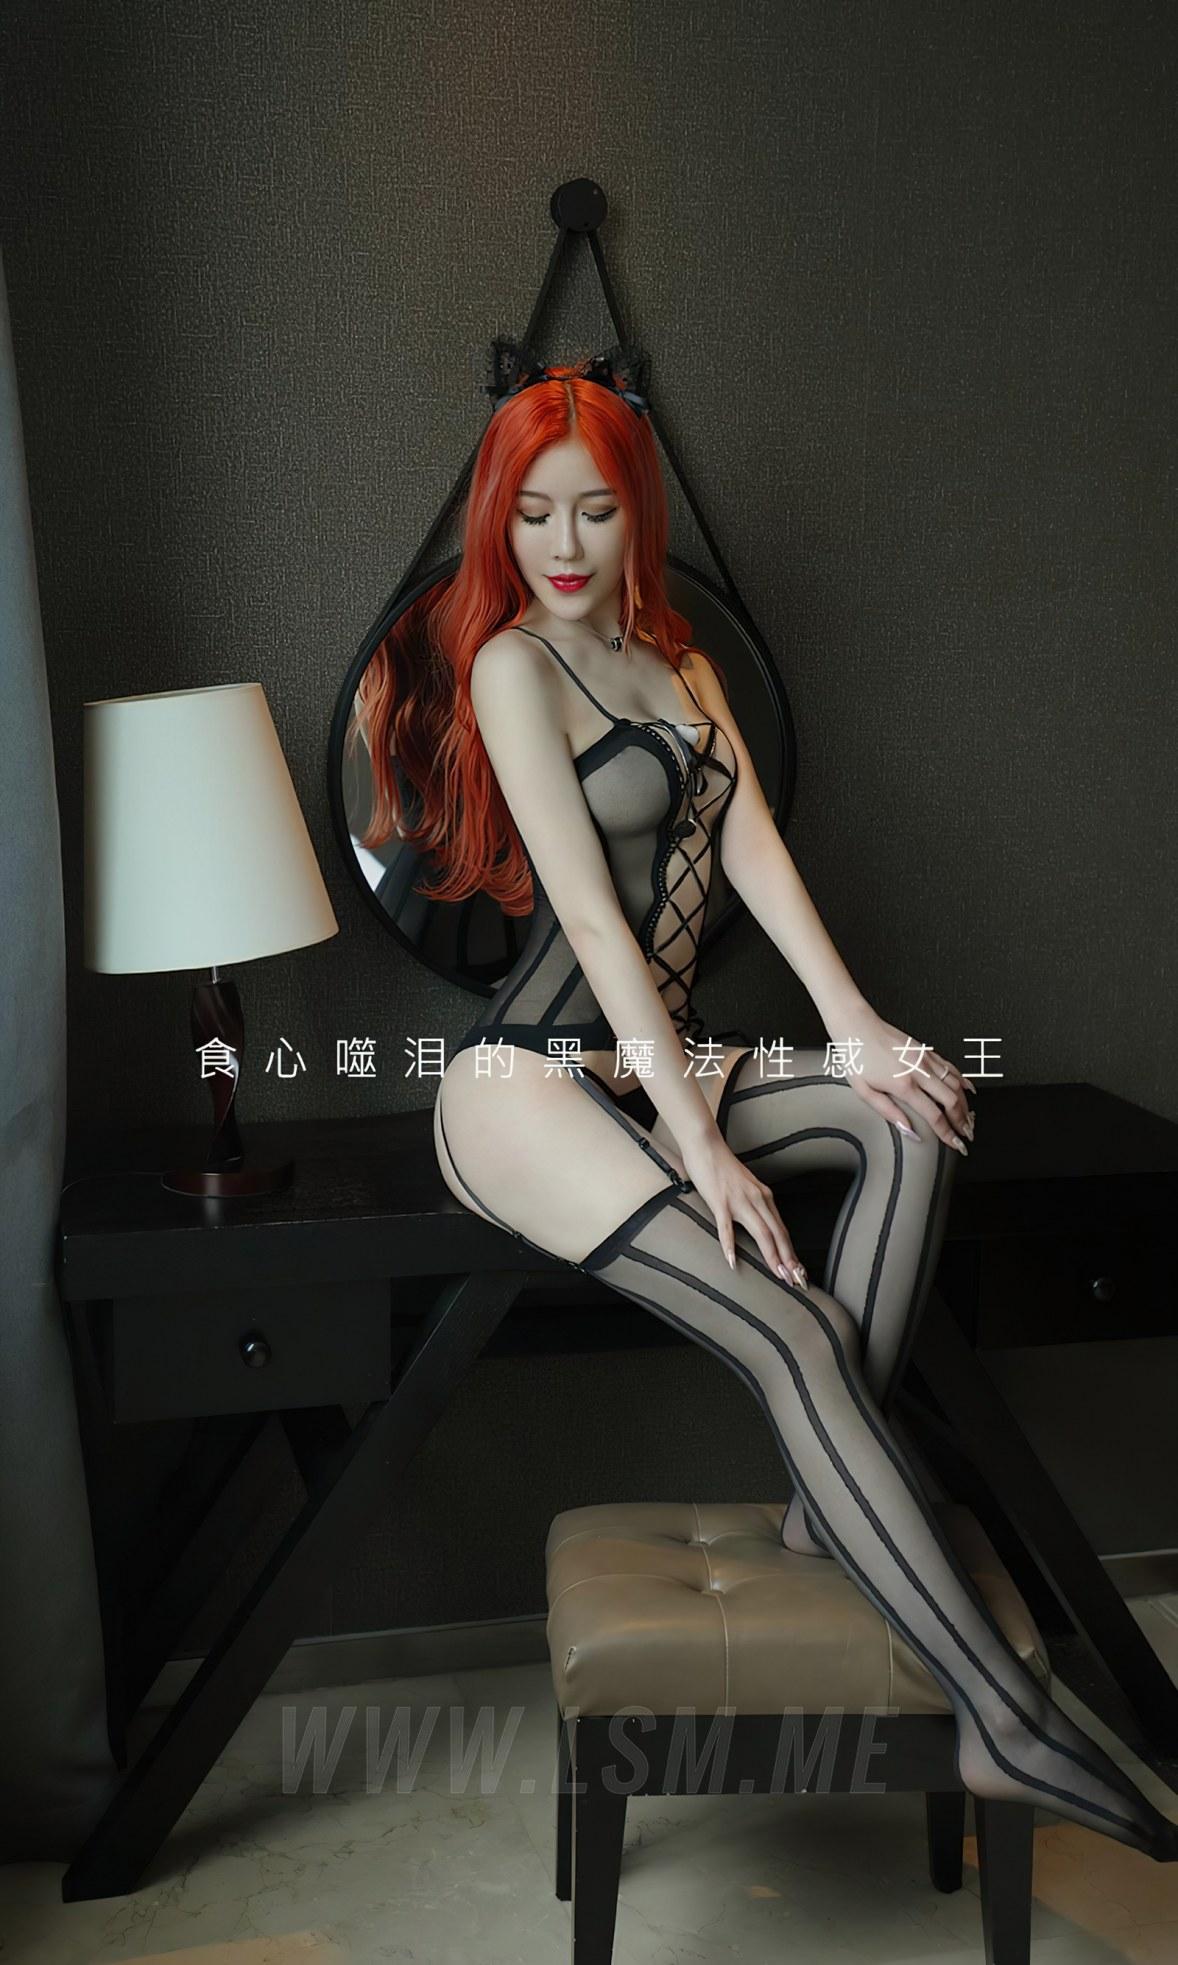 UGirls 爱尤物 No.2073 允熙 红皇后 - 2